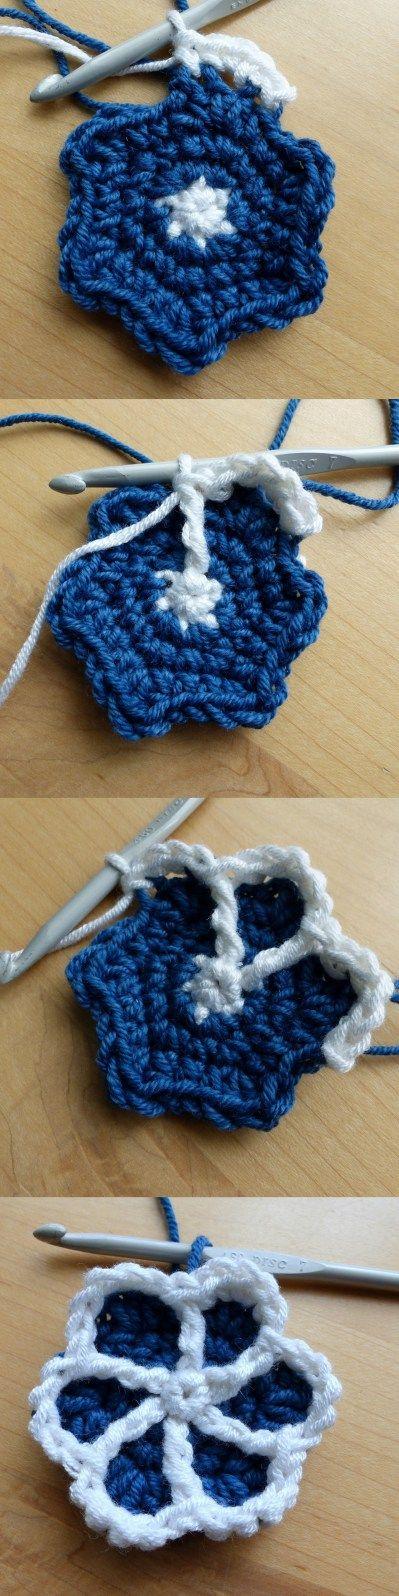 Moroccan Hexagon Motif Round 5 - Free Crochet Pattern by Make My Day Creative